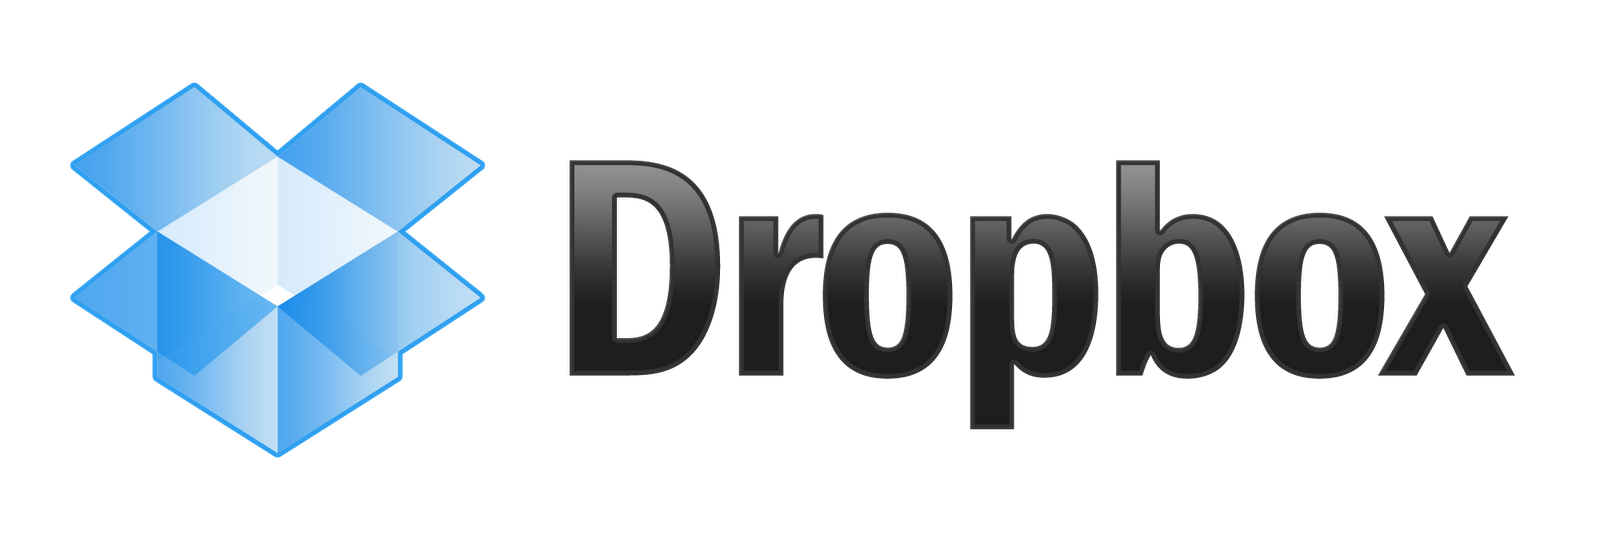 https://www.dropbox.com